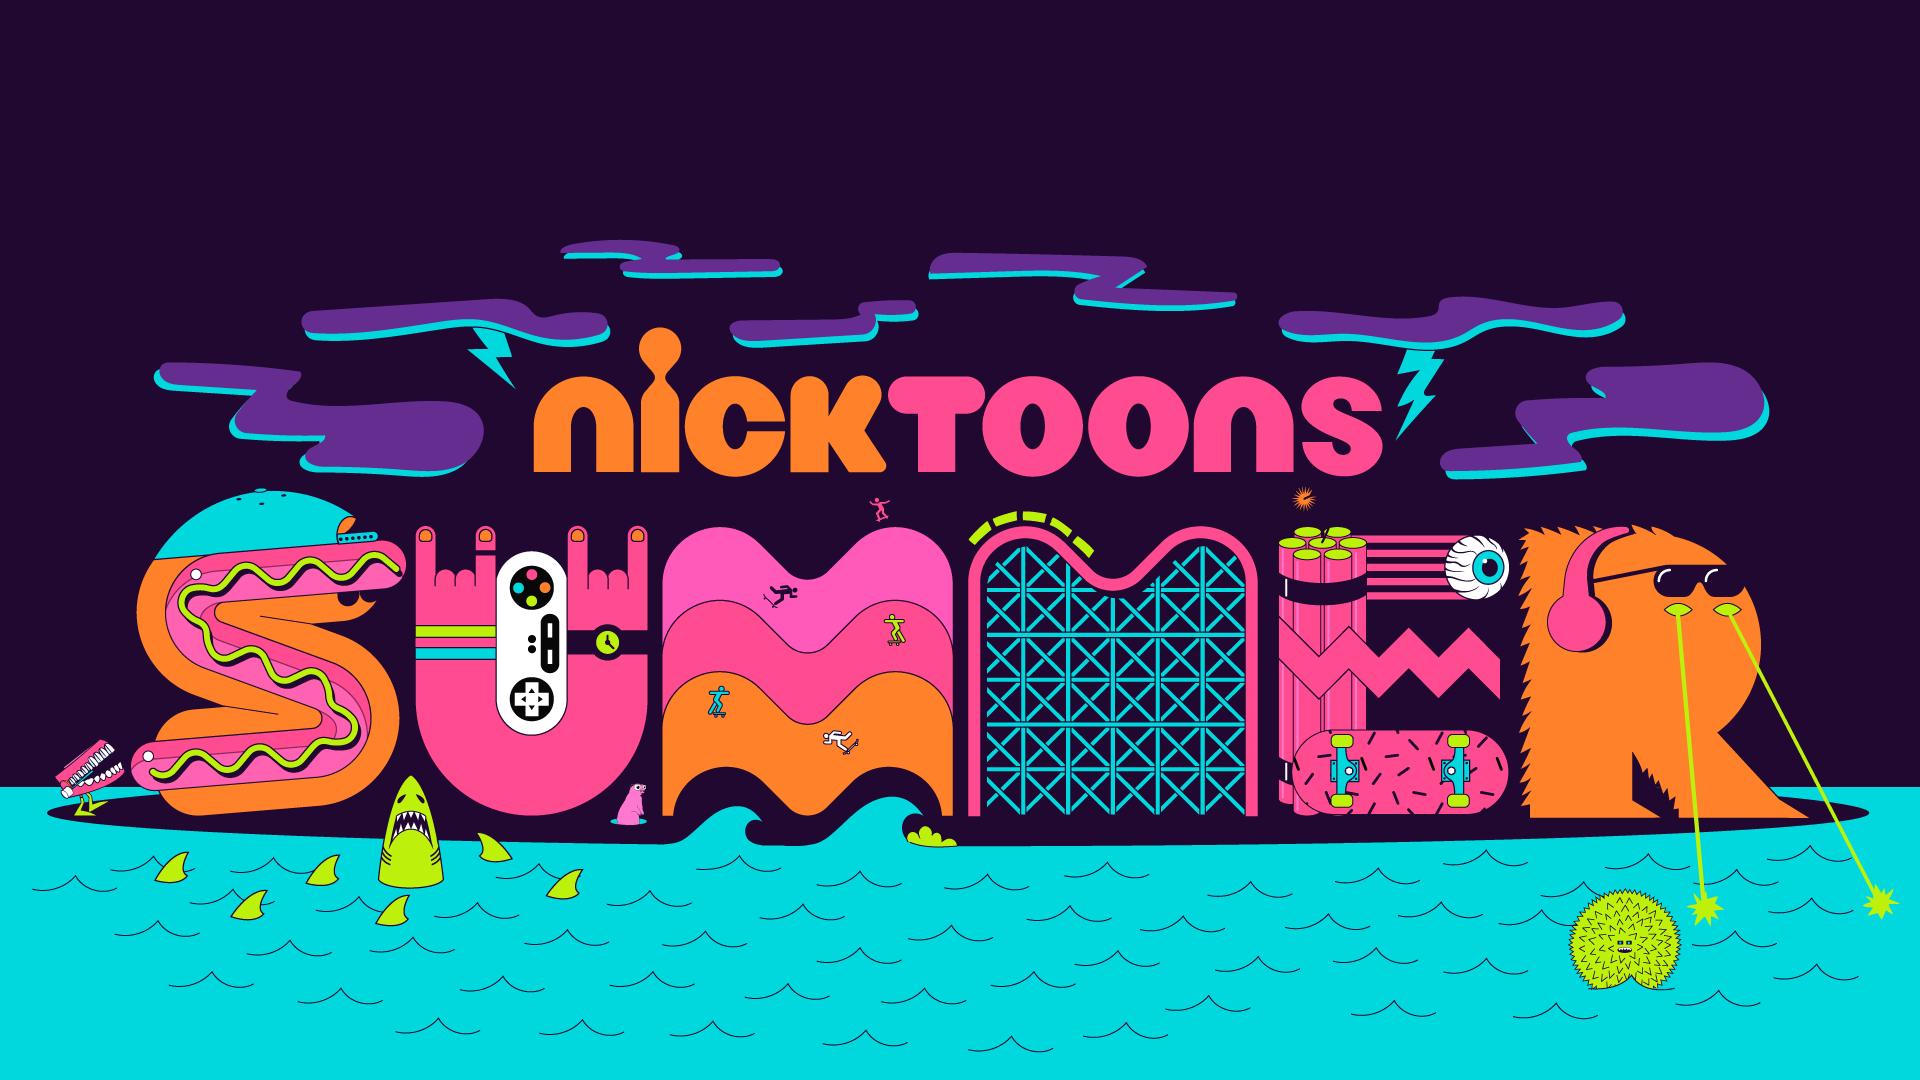 Nicktoons_Summer_Process_Justin-Harder_08.png